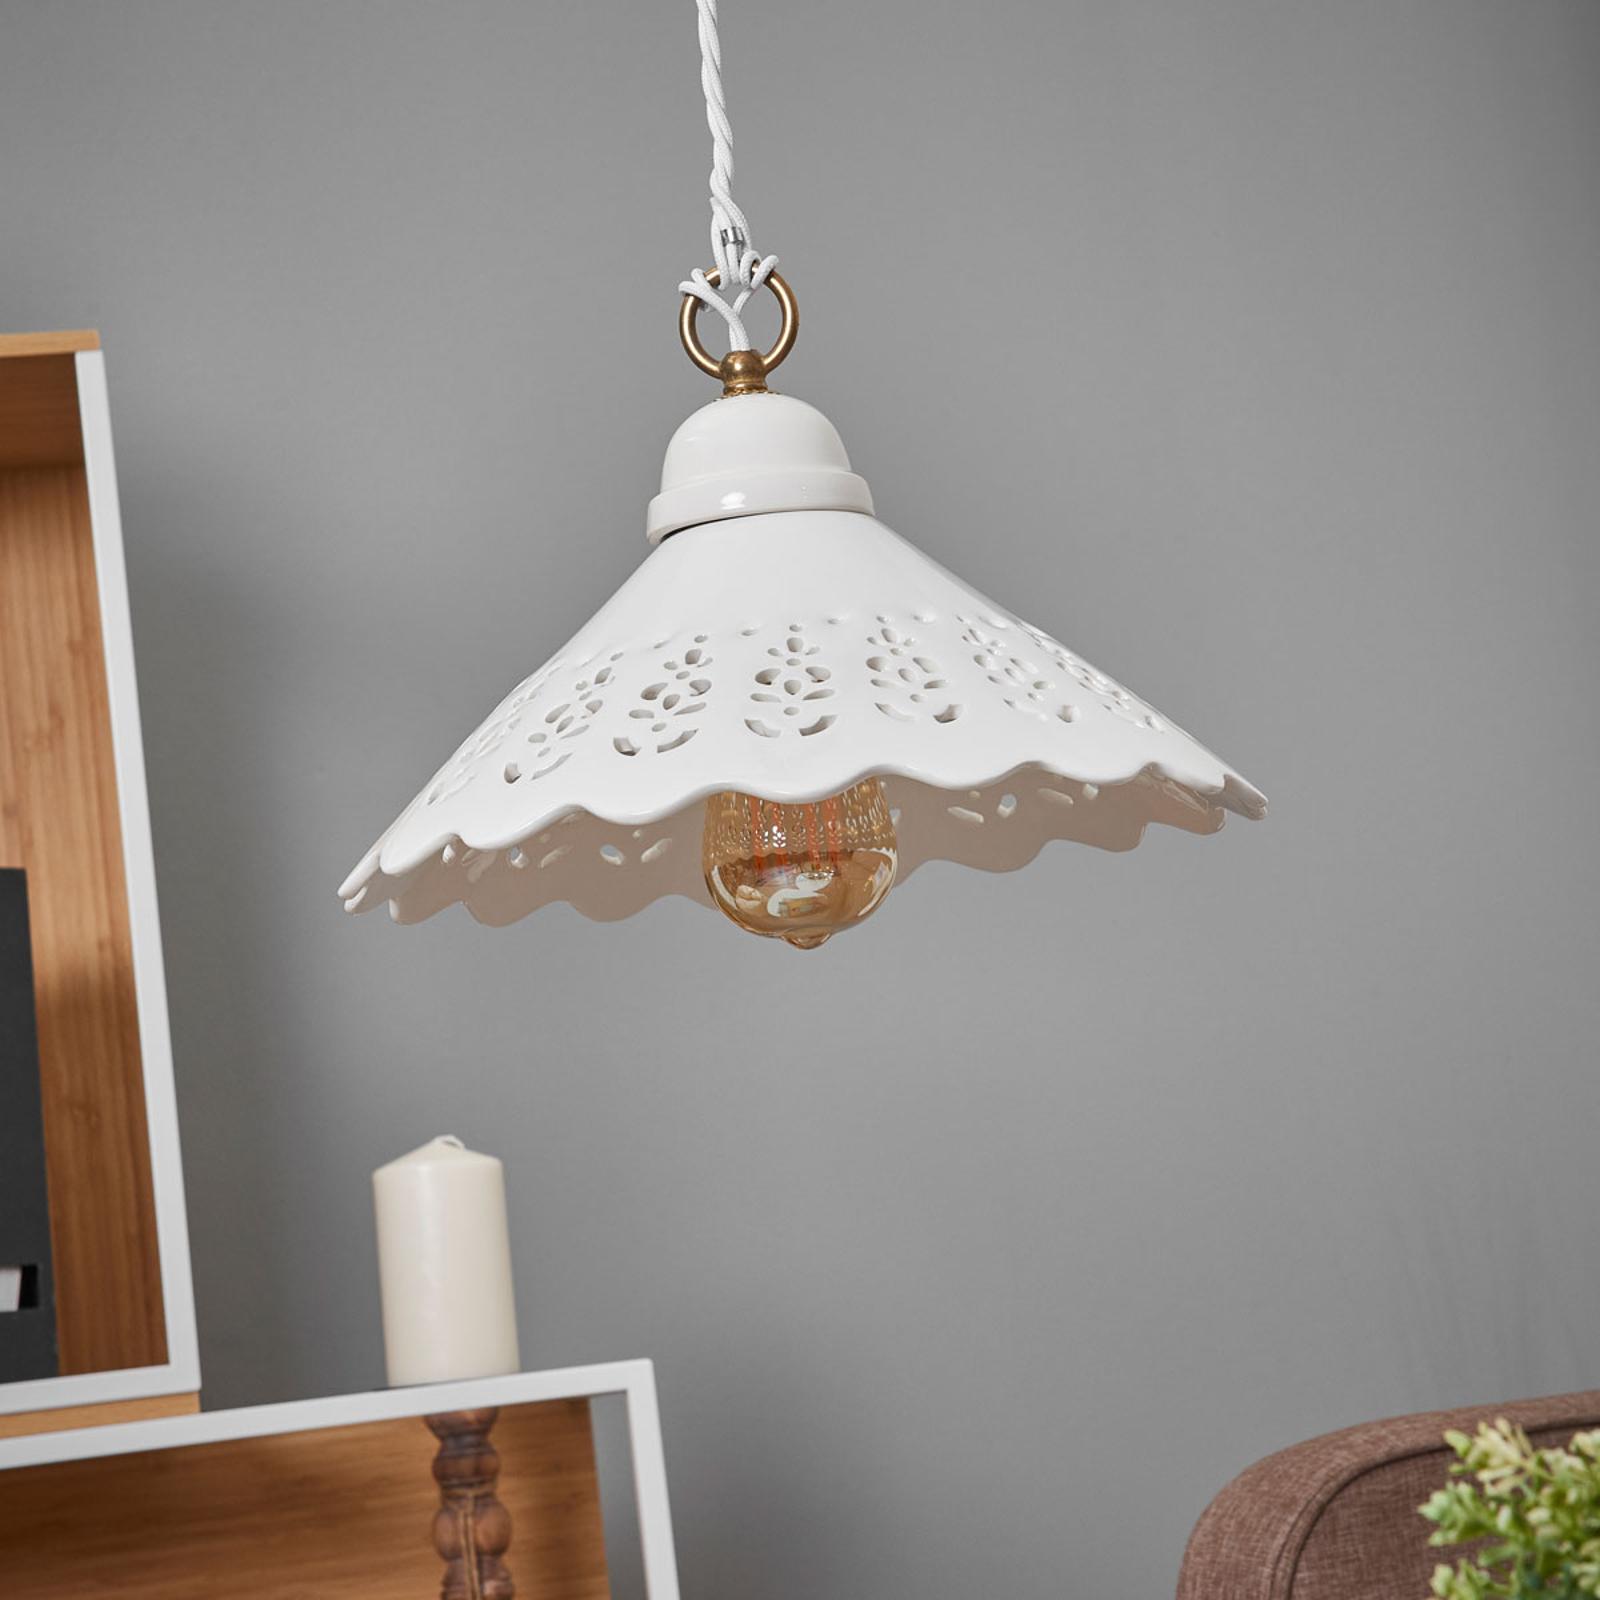 Hanglamp Pizzo, 1-lamps., 30 cm